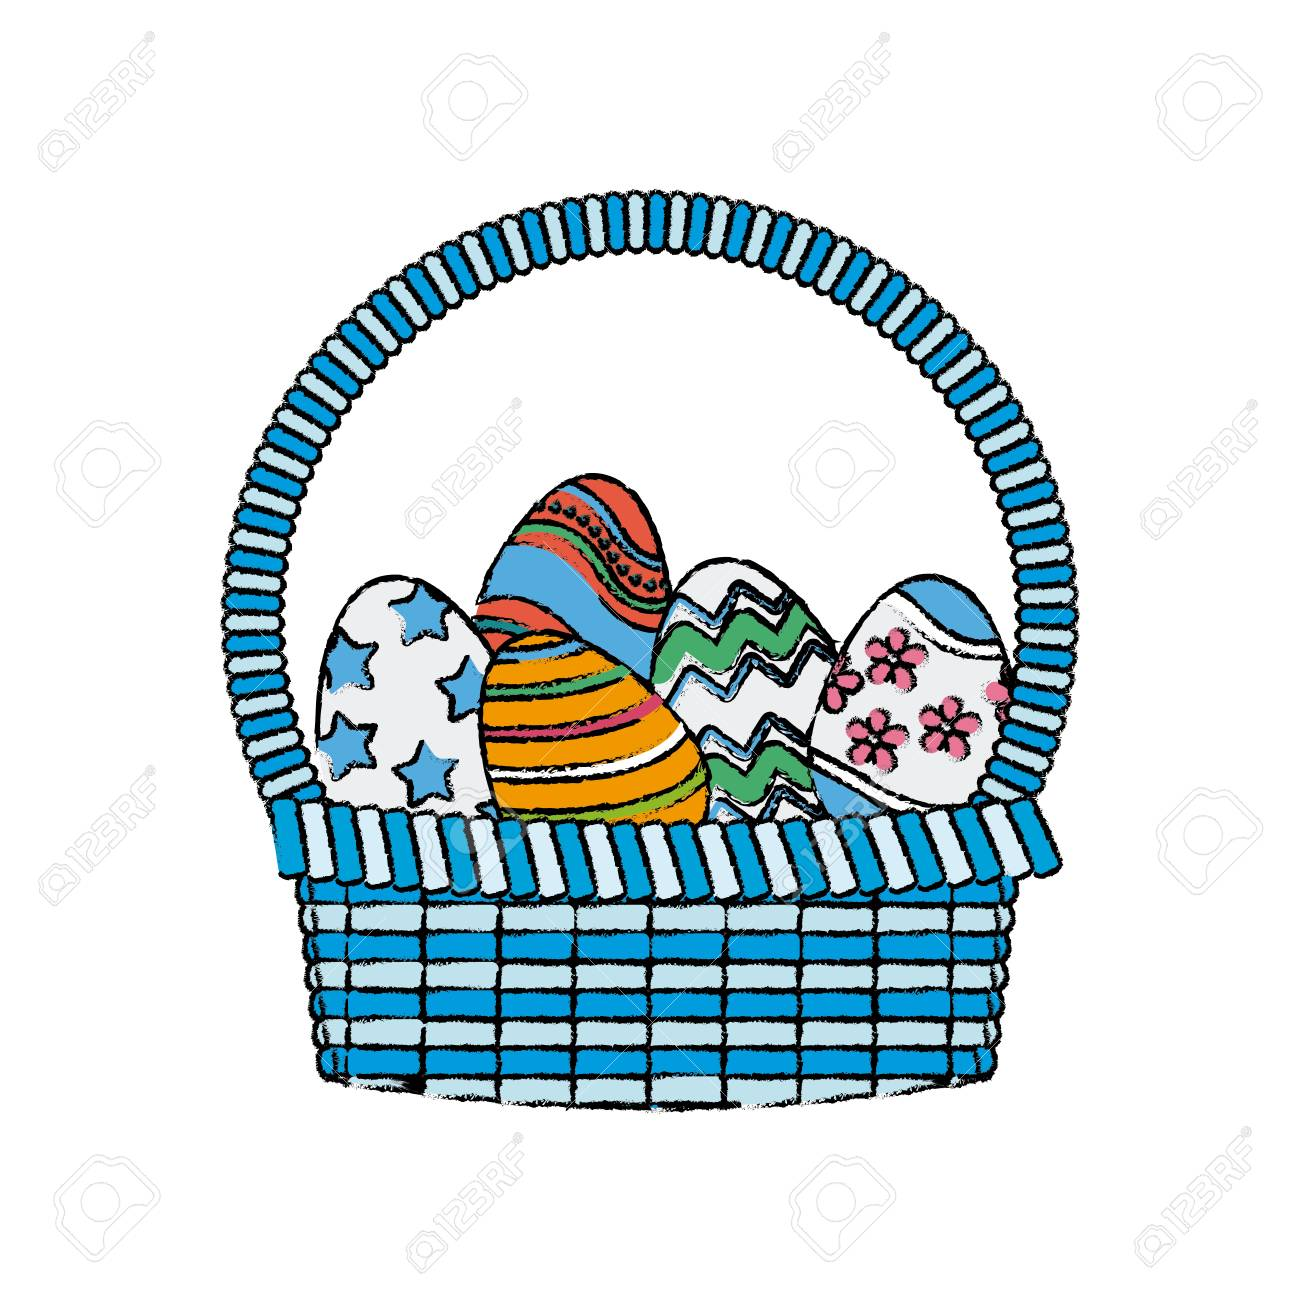 Drawing Happy Easter Basket Egg Decoration Image Vector Illustration Stock Vector 81146263